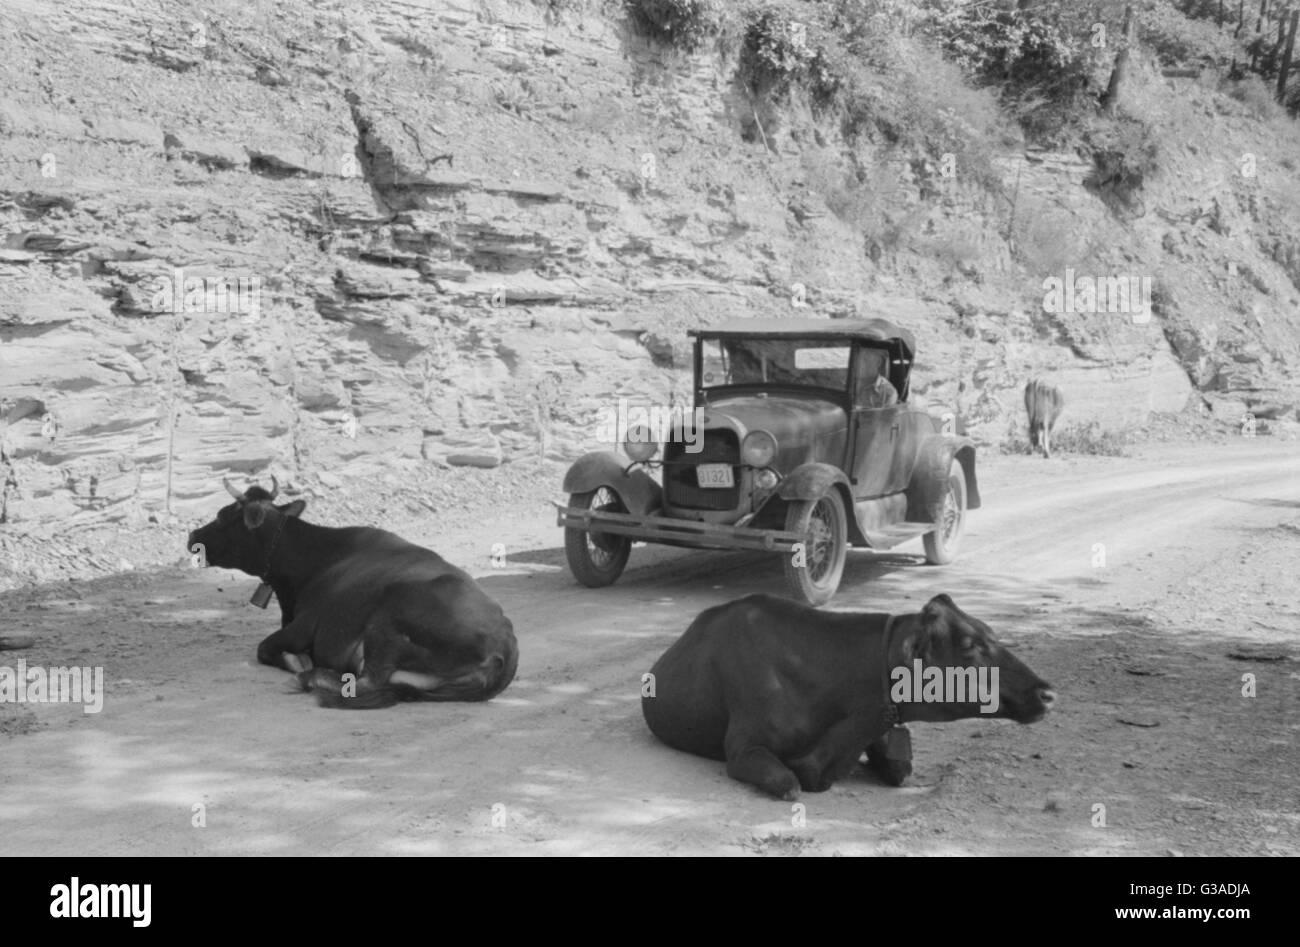 One of the hazards of driving over Kentucky mountain roads. Near Jackson, Breathitt County, Kentucky. Date 1940 - Stock Image